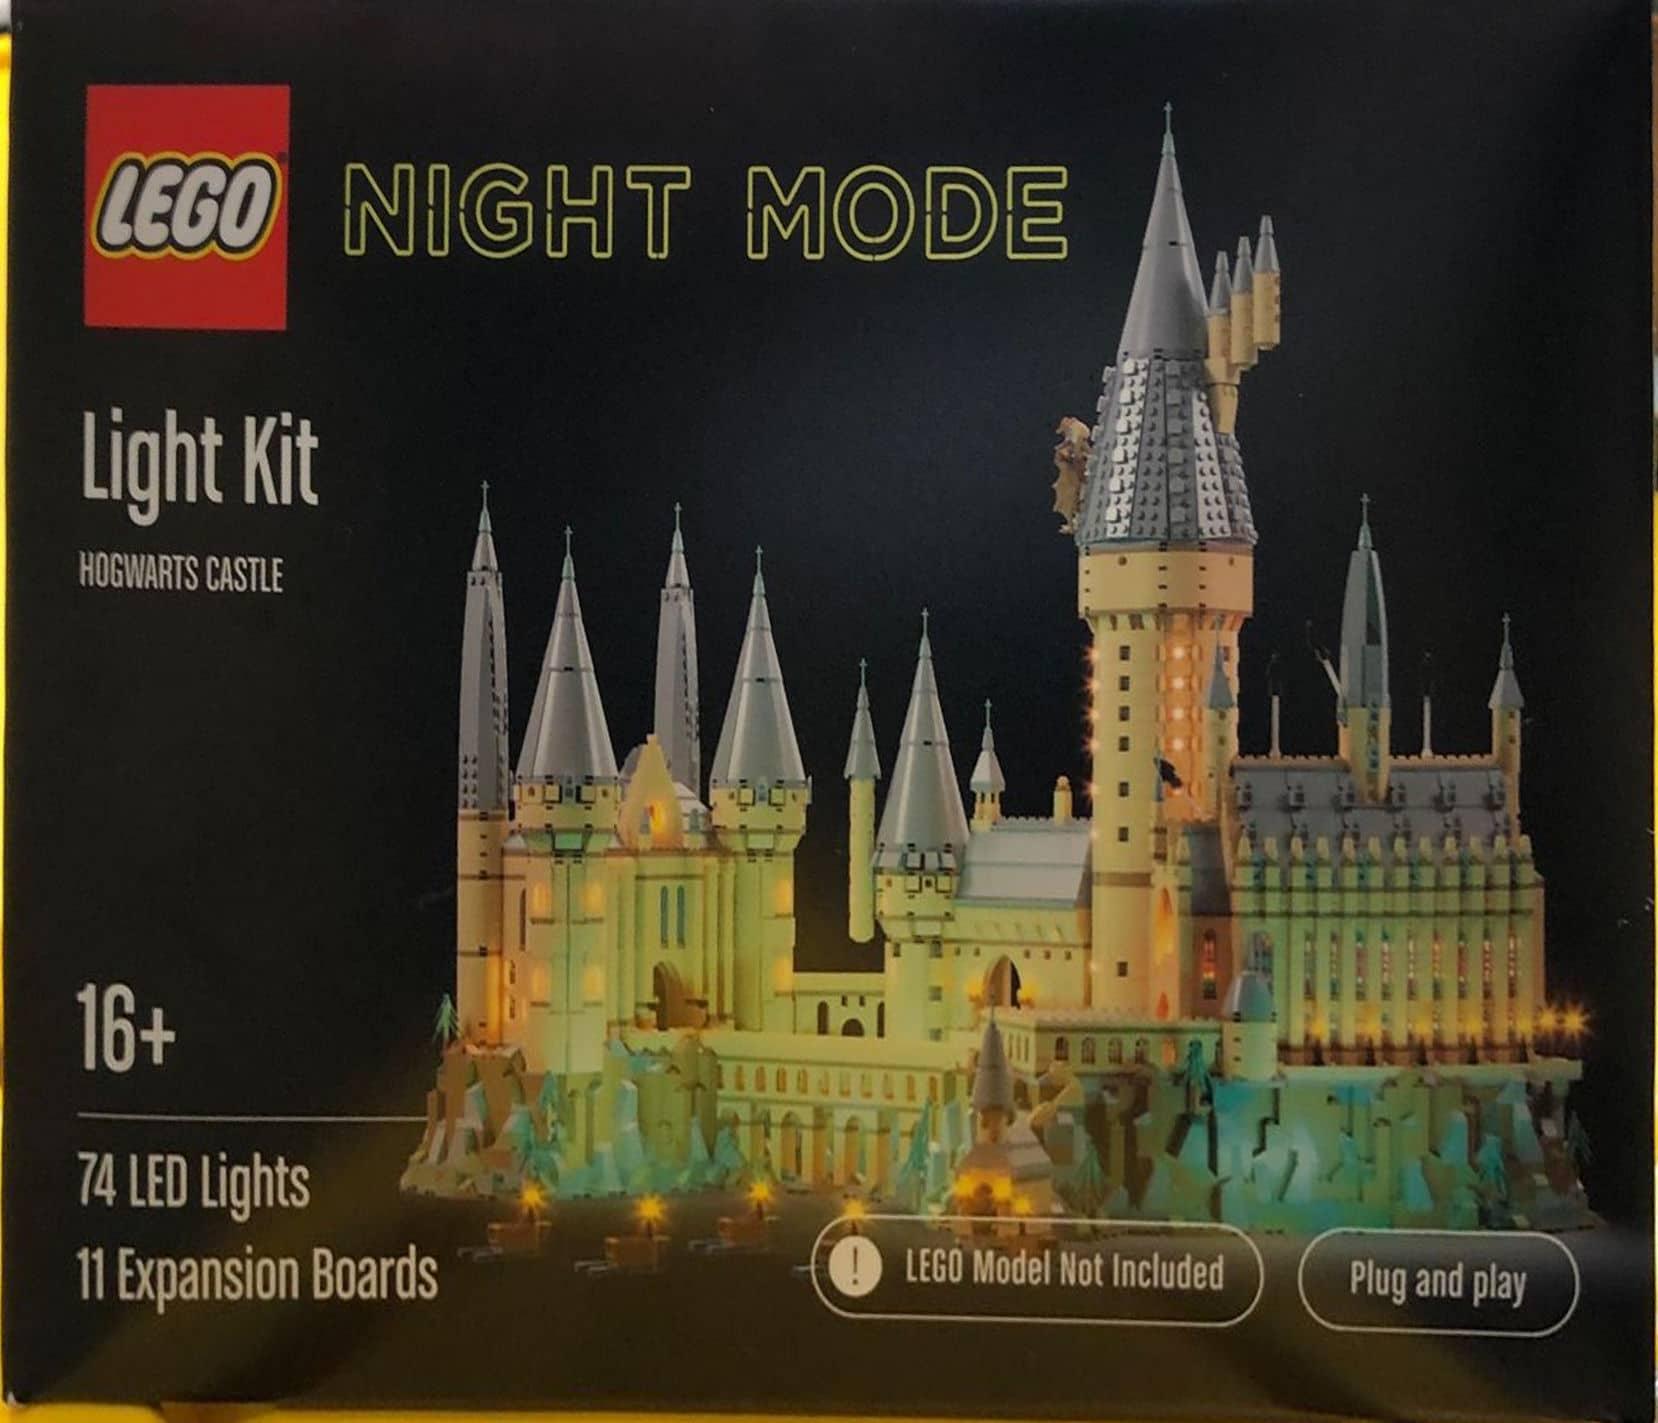 https://www.bricktastic.nl/wp-content/uploads/2020/02/LEGO-Night-Mode-Hogwarts-Castle.jpg